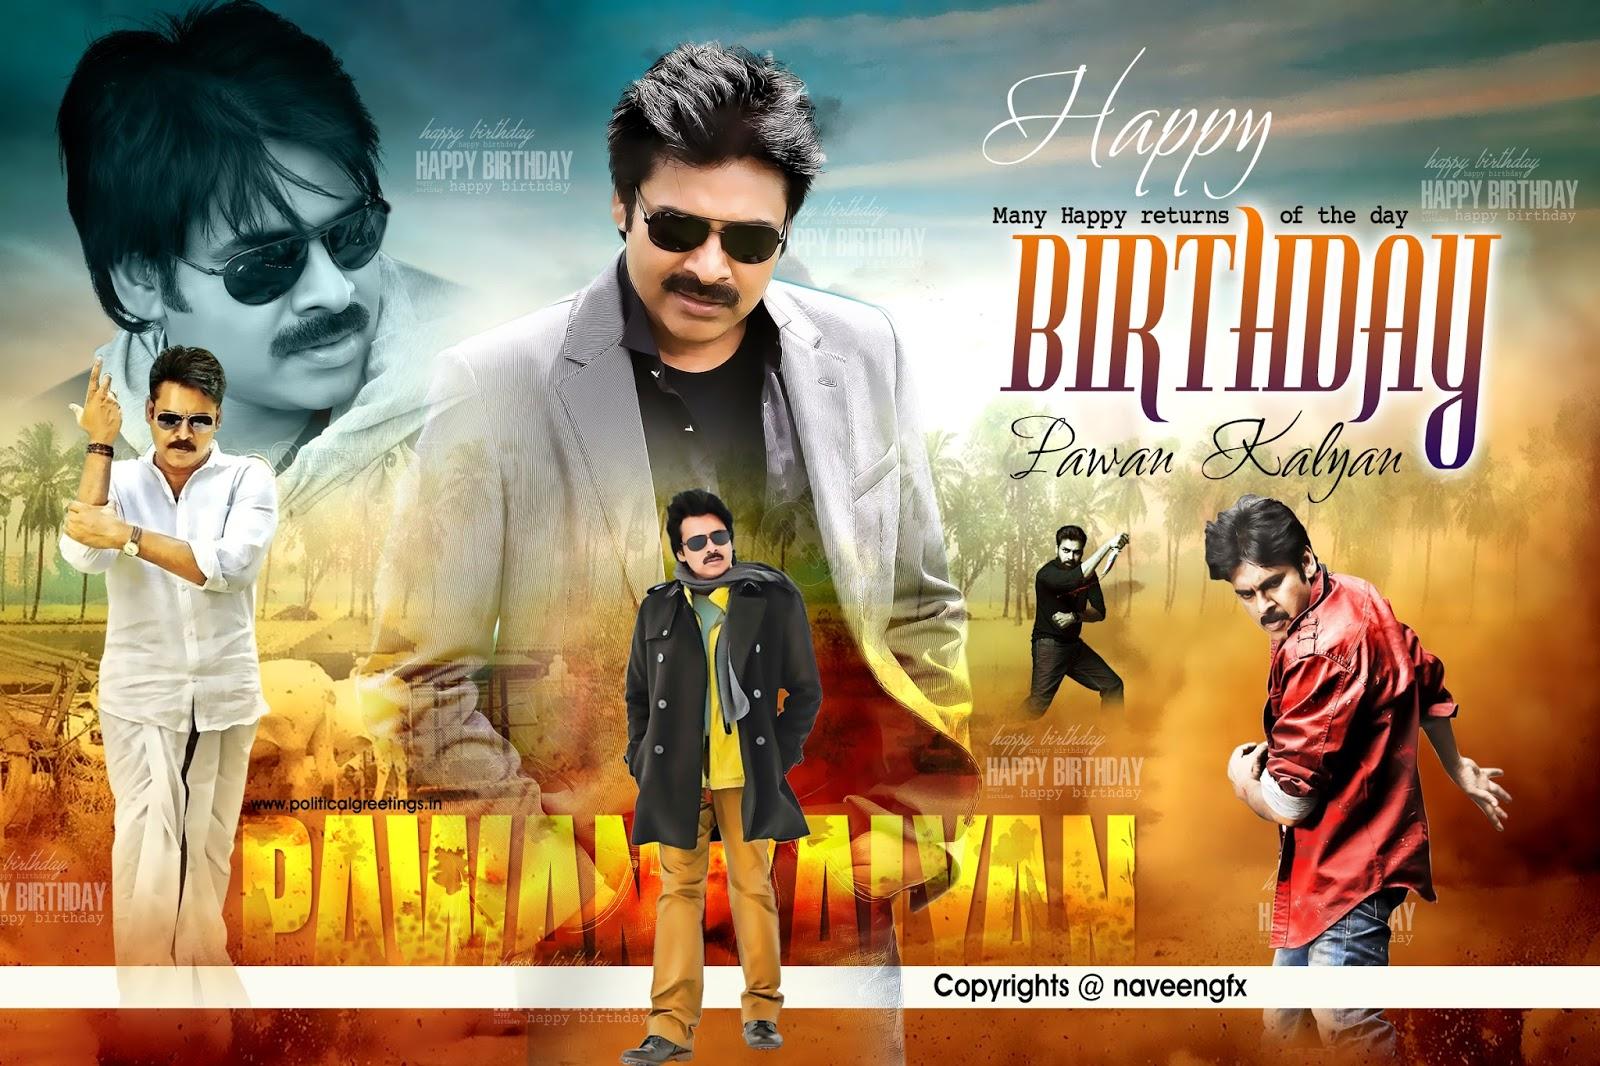 pawan kalyan birthday poster psd template free downloads | naveengfx